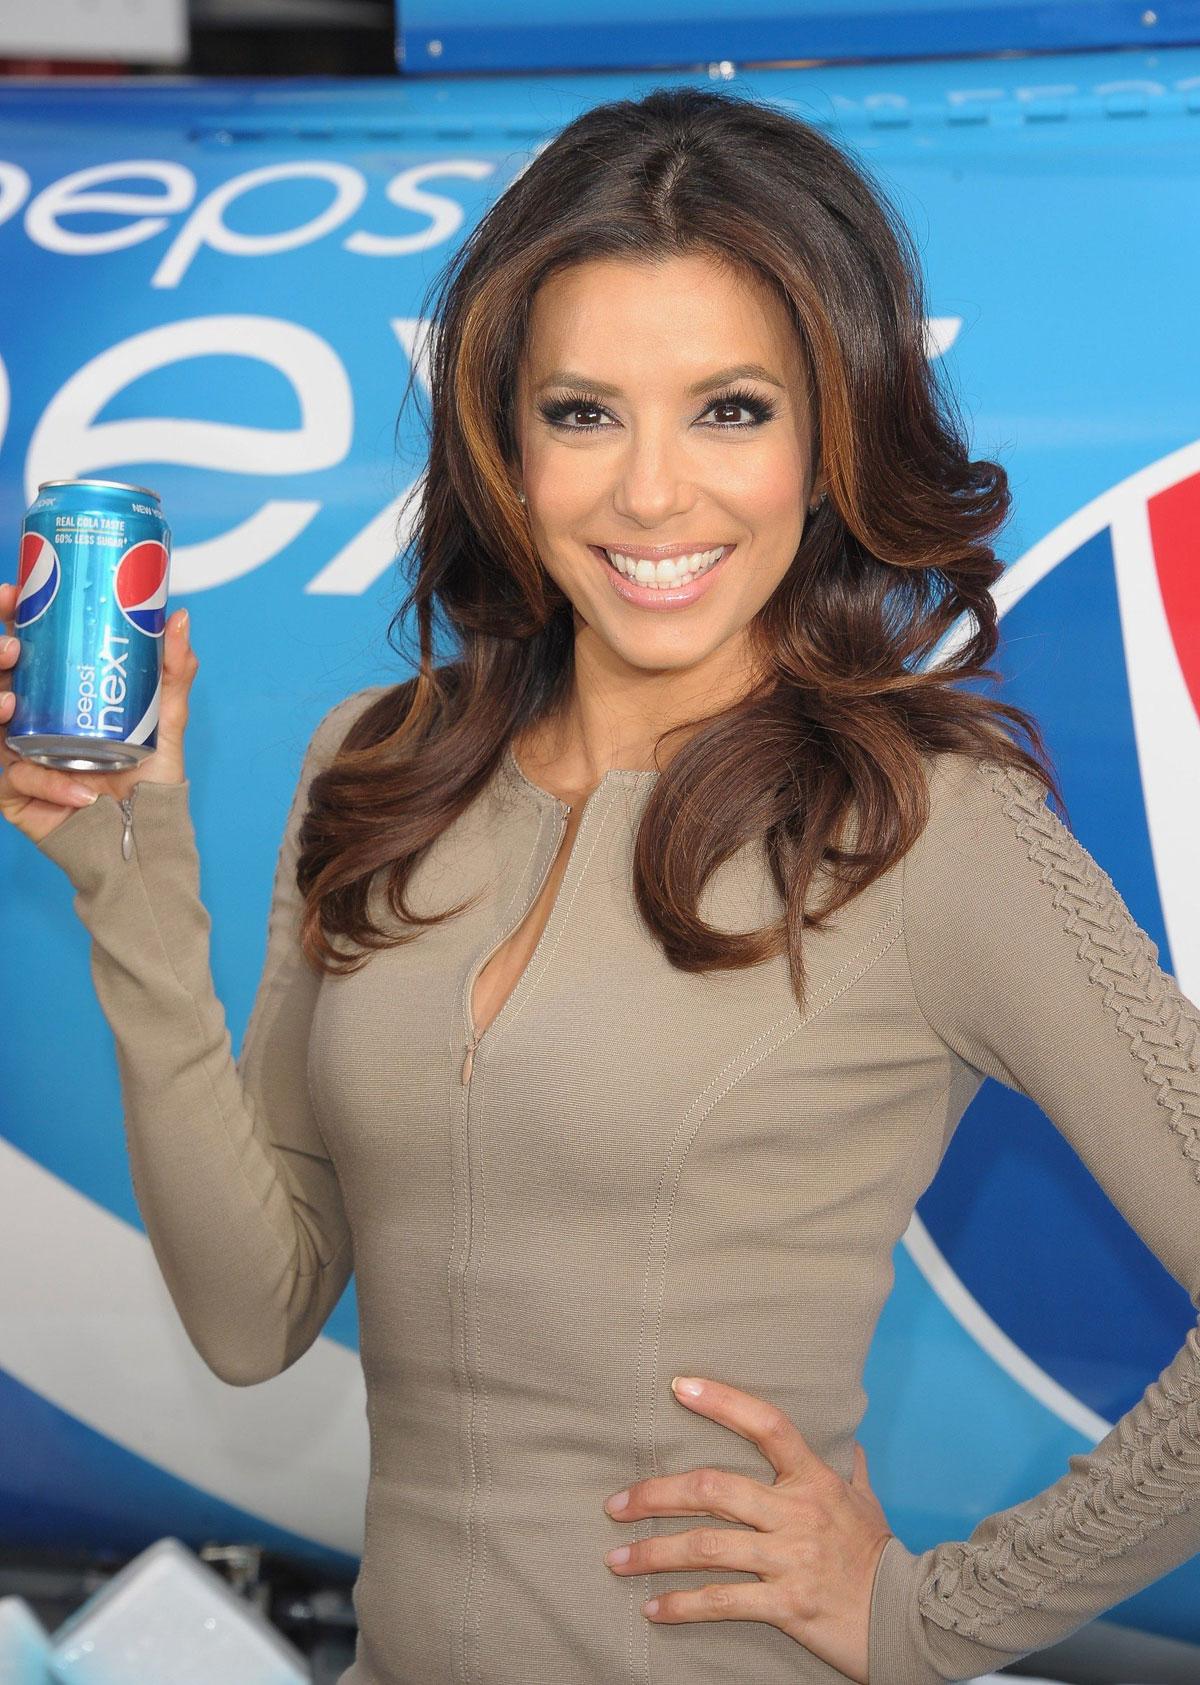 EVA LONGORIA Promotes the Pepsi Next Drink It To Believe It in New ... Eva Longoria